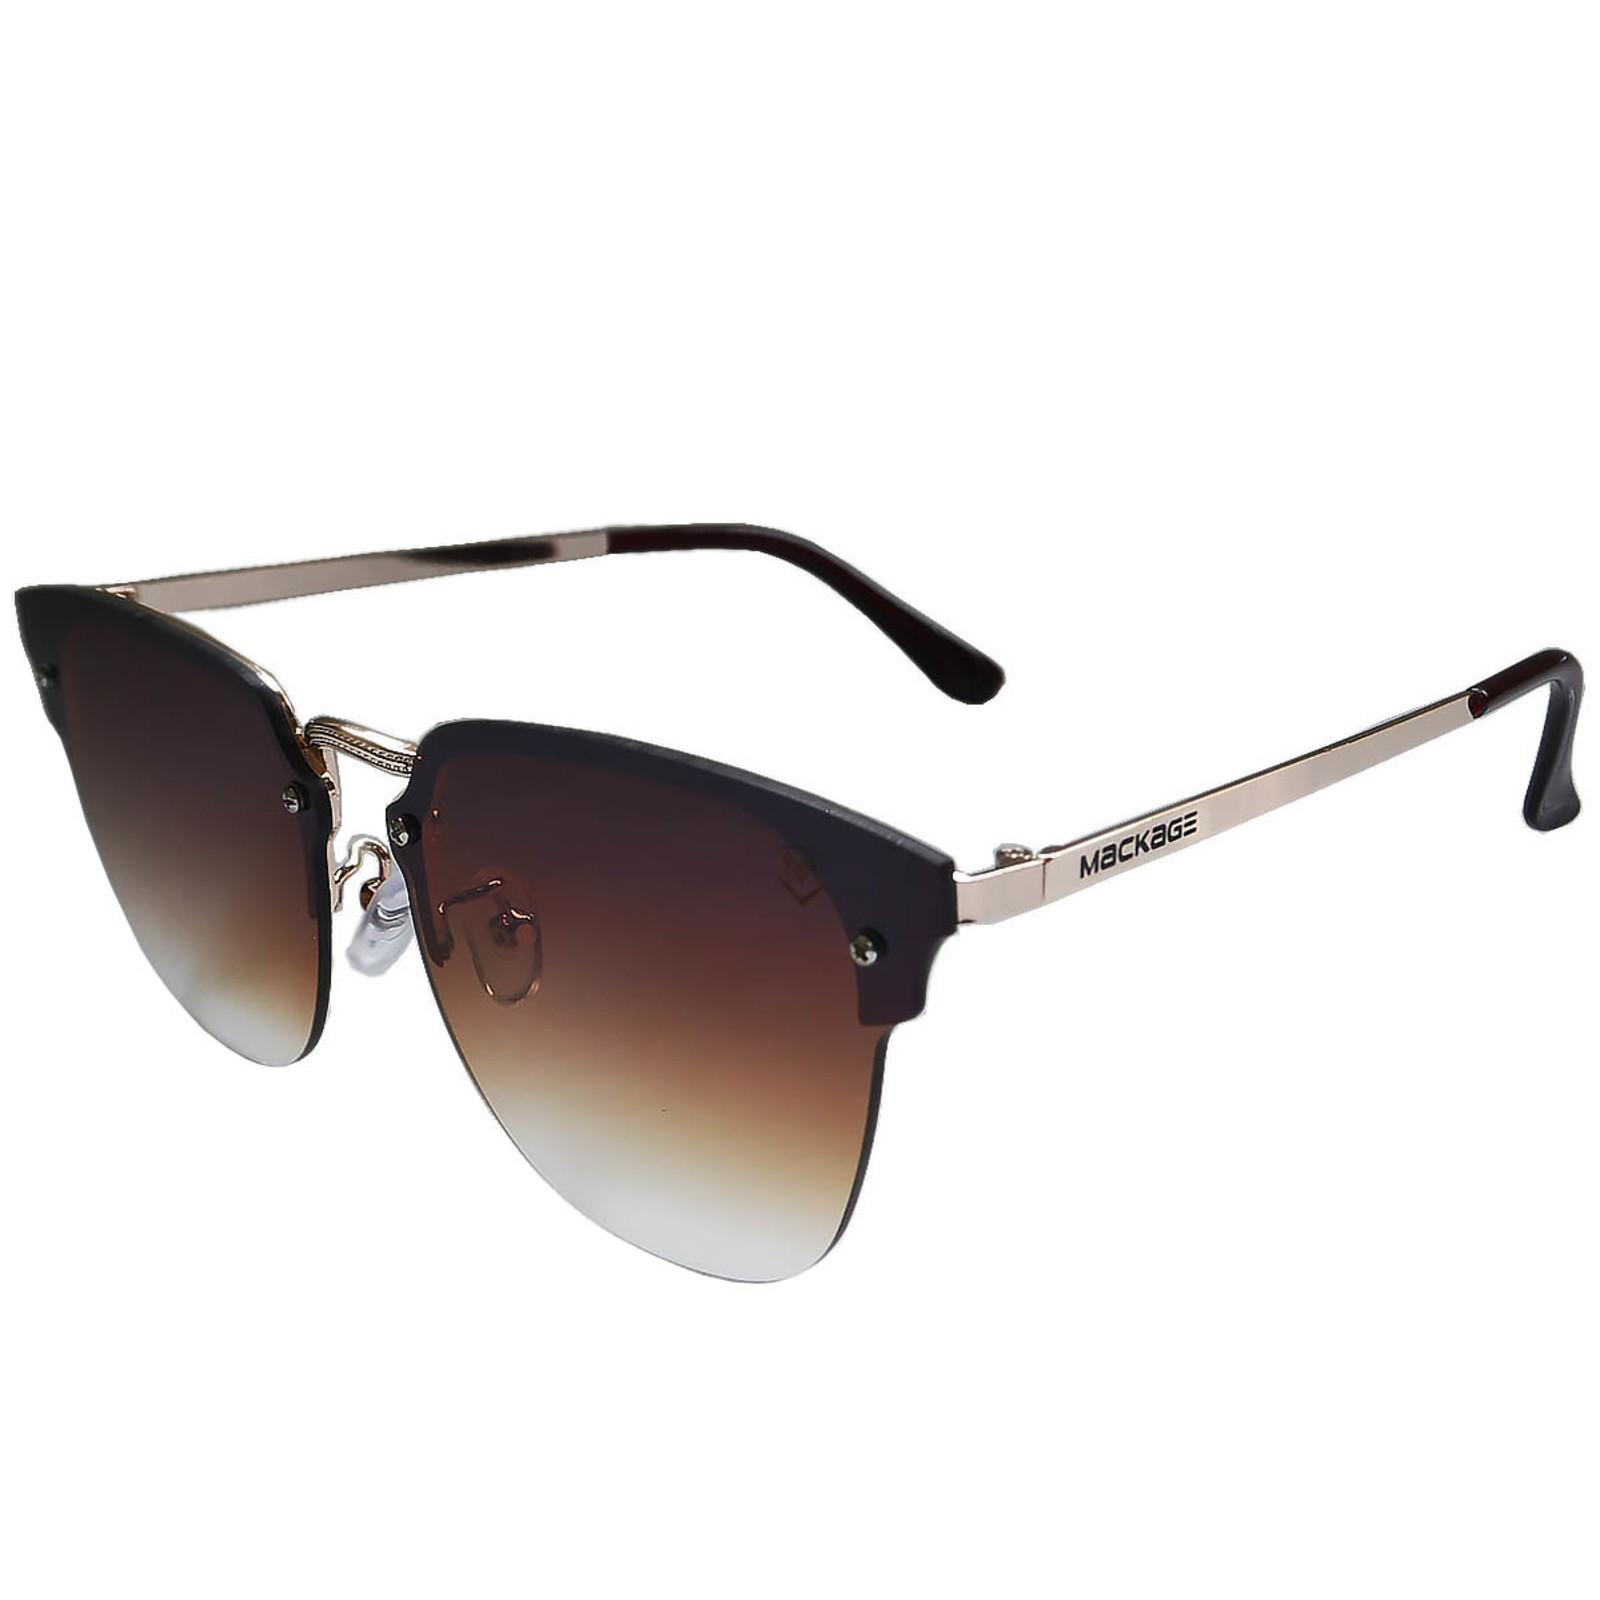 Óculos De Sol Mackage Feminino Metal Gateado Rimless - Marrom